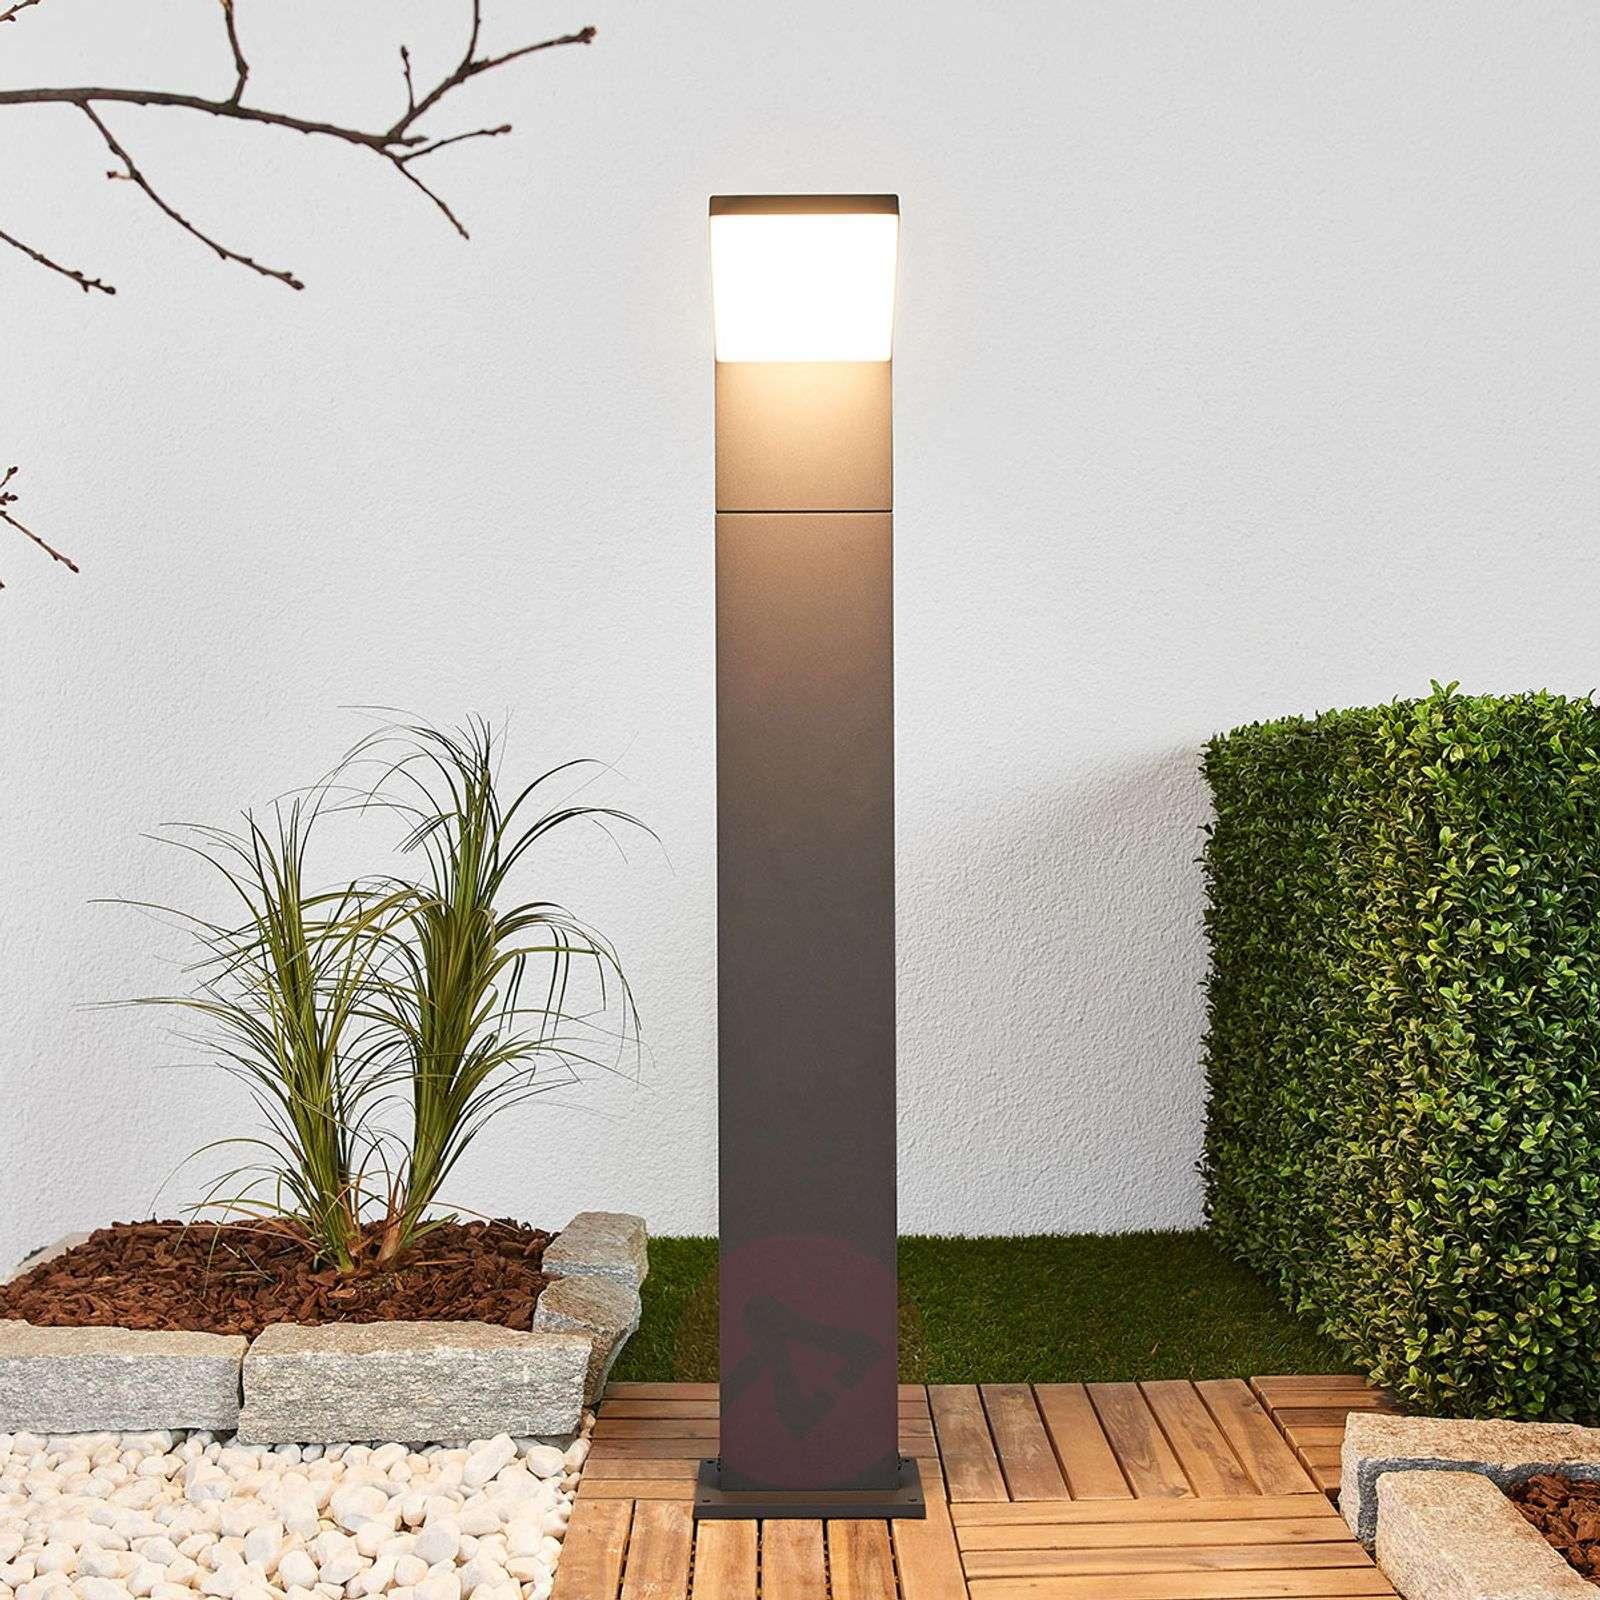 Grafiitinharmaa LED-pollarivalaisin Yolena, 100 cm-9619120-03